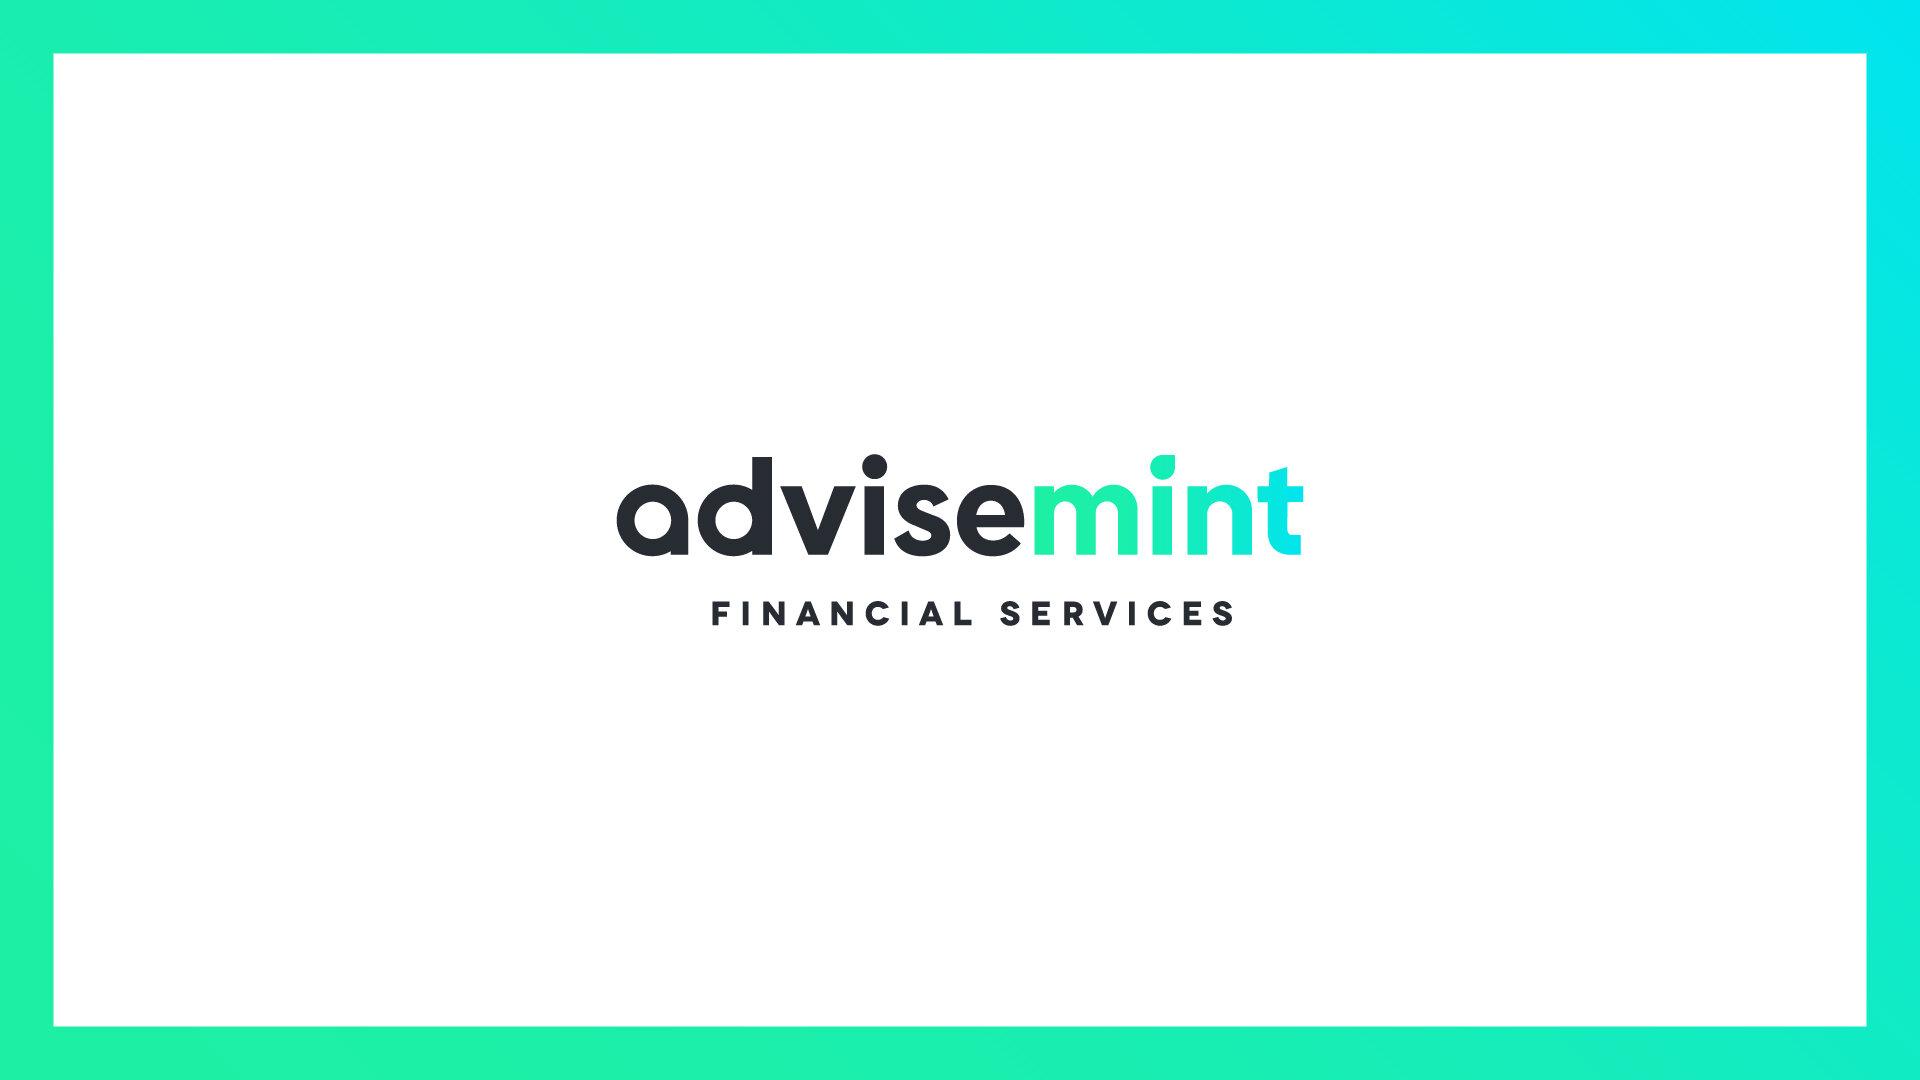 Advisemint-Logo-Full-Width.jpg